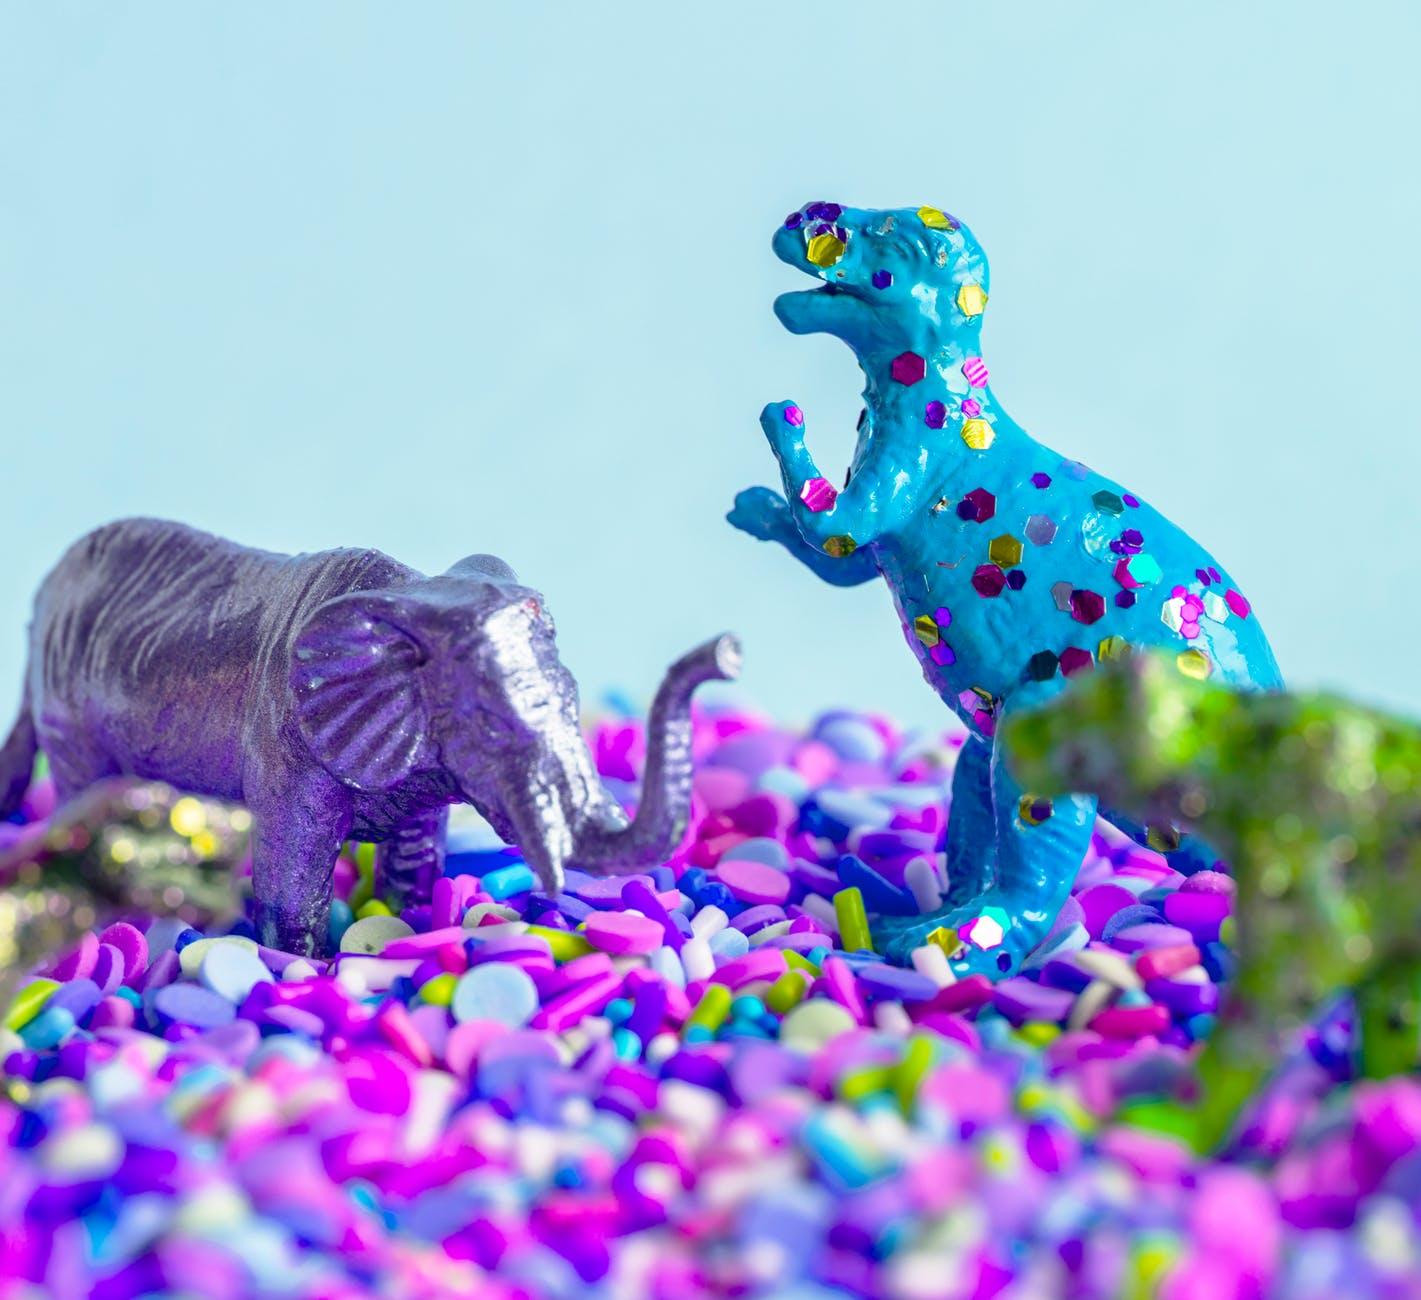 gray and blue dinosaure ffigurines